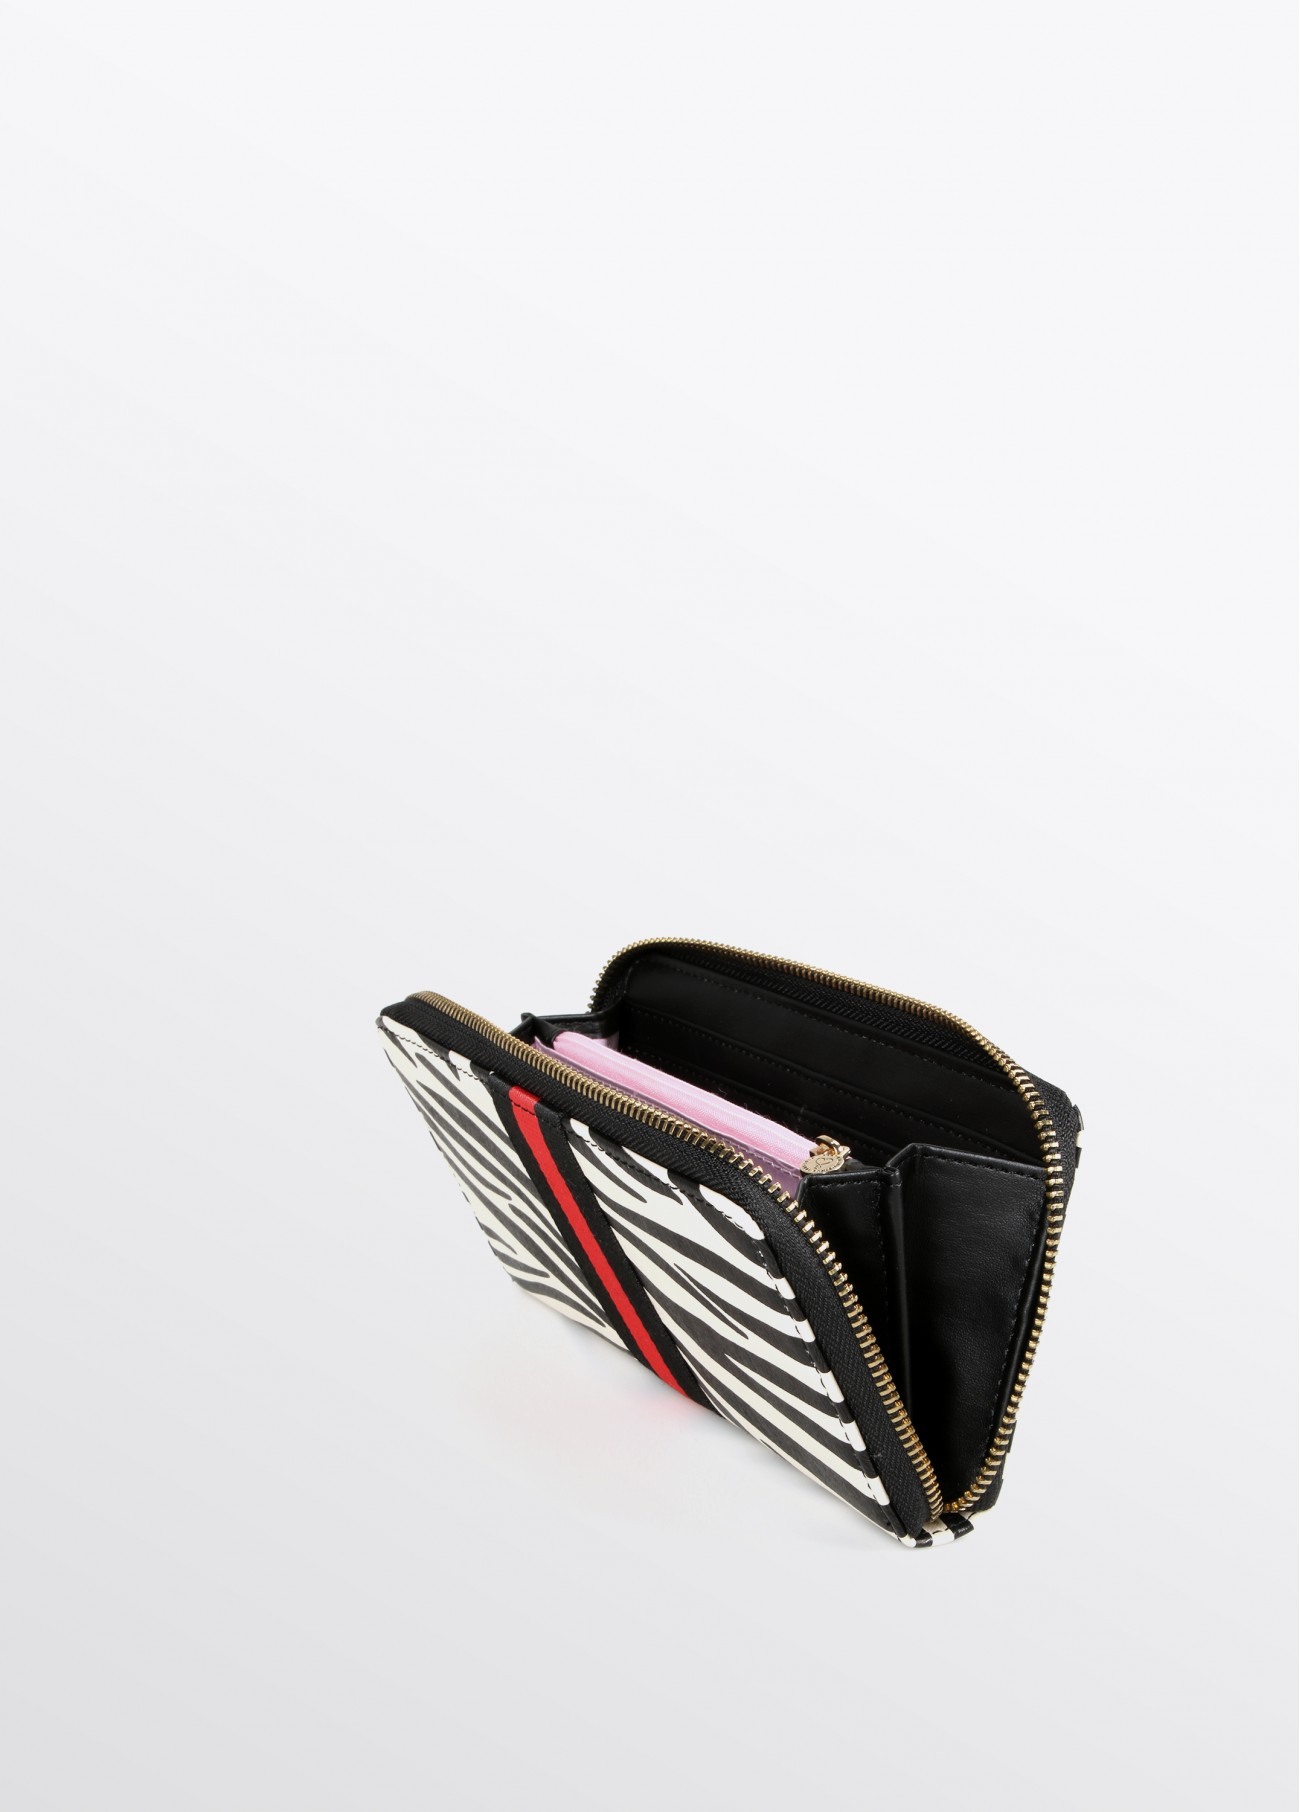 Monedero cebra, estampado 2